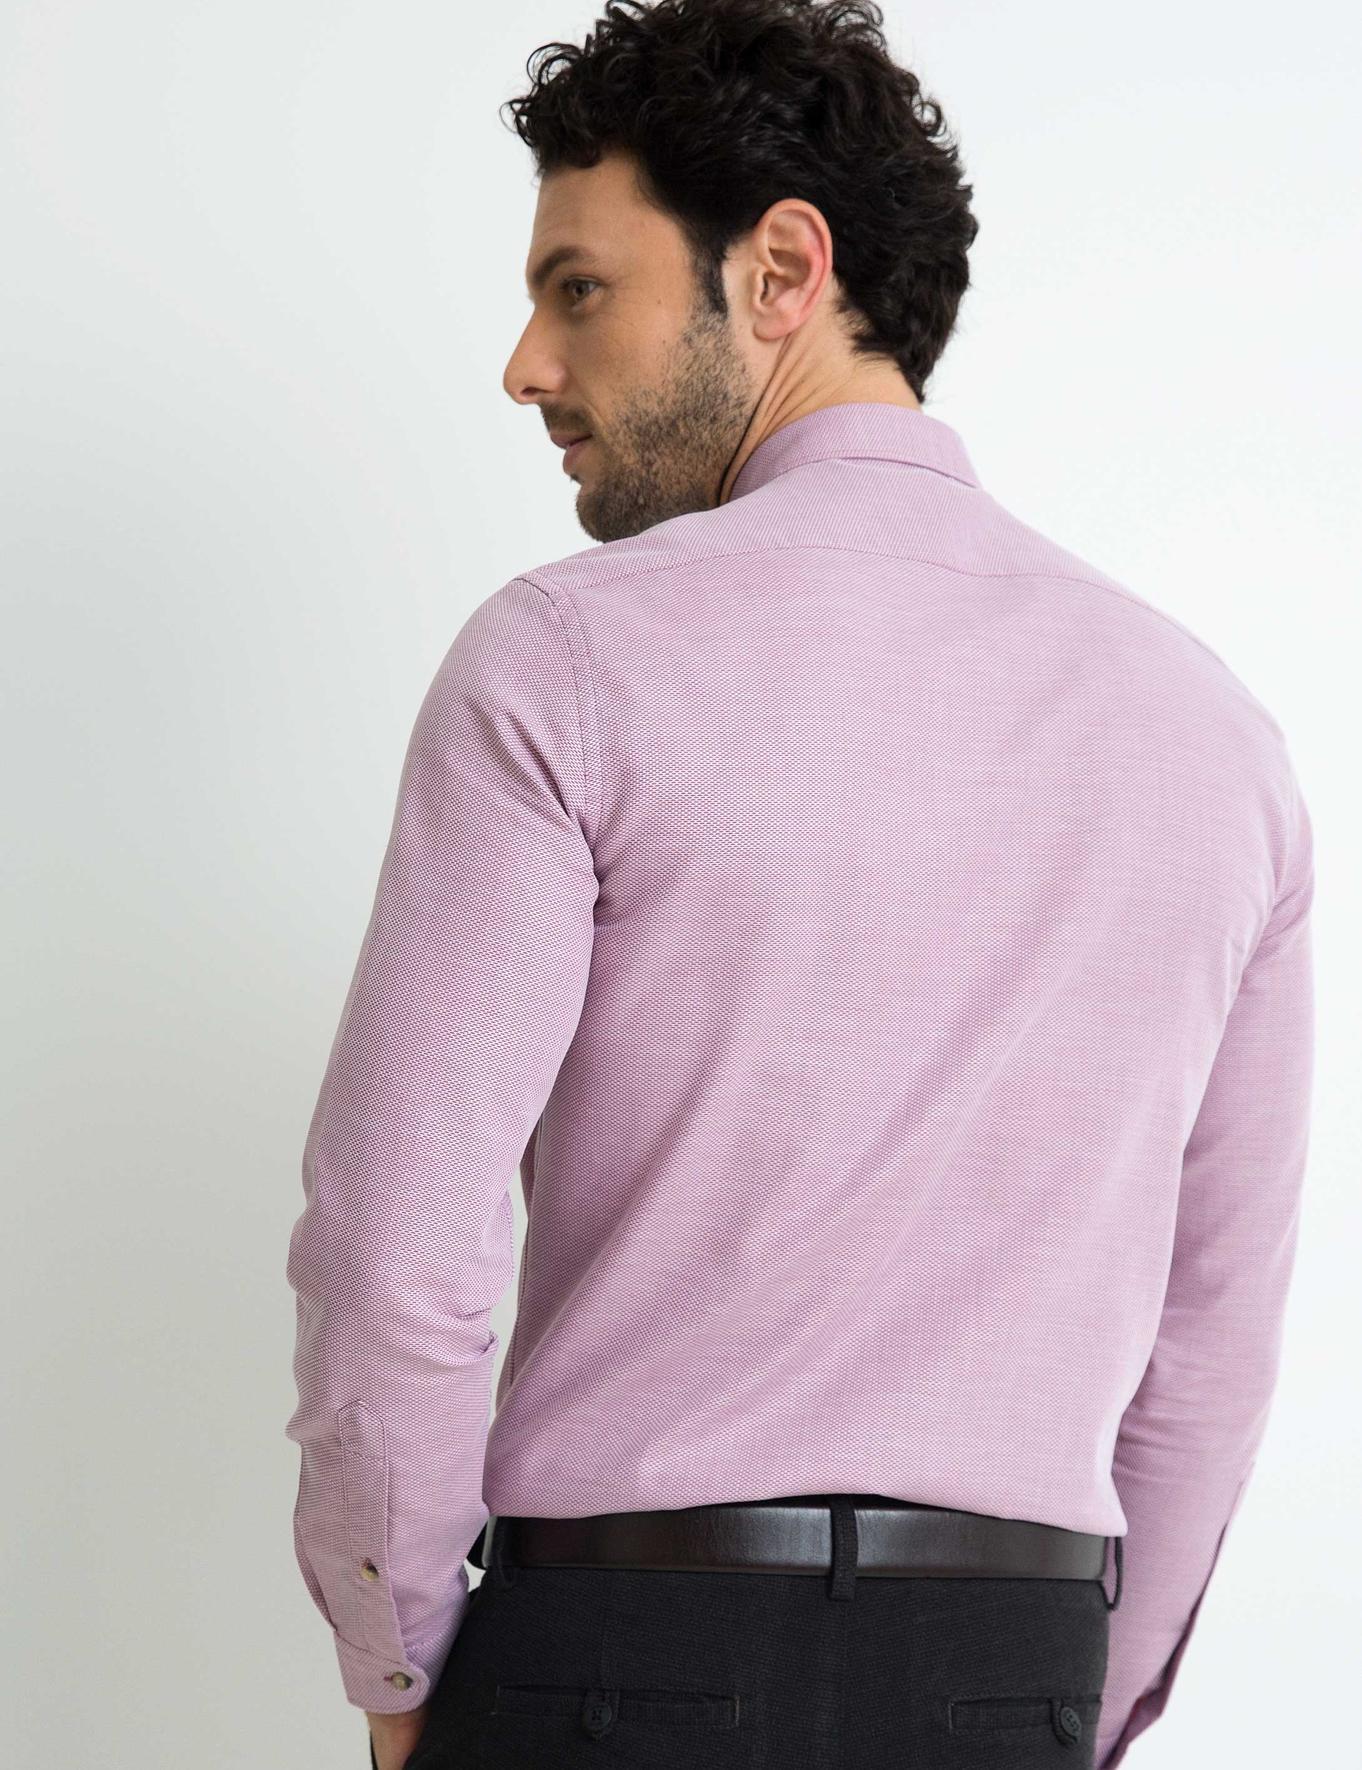 Bordo Slim Fit Gömlek - 50194662018